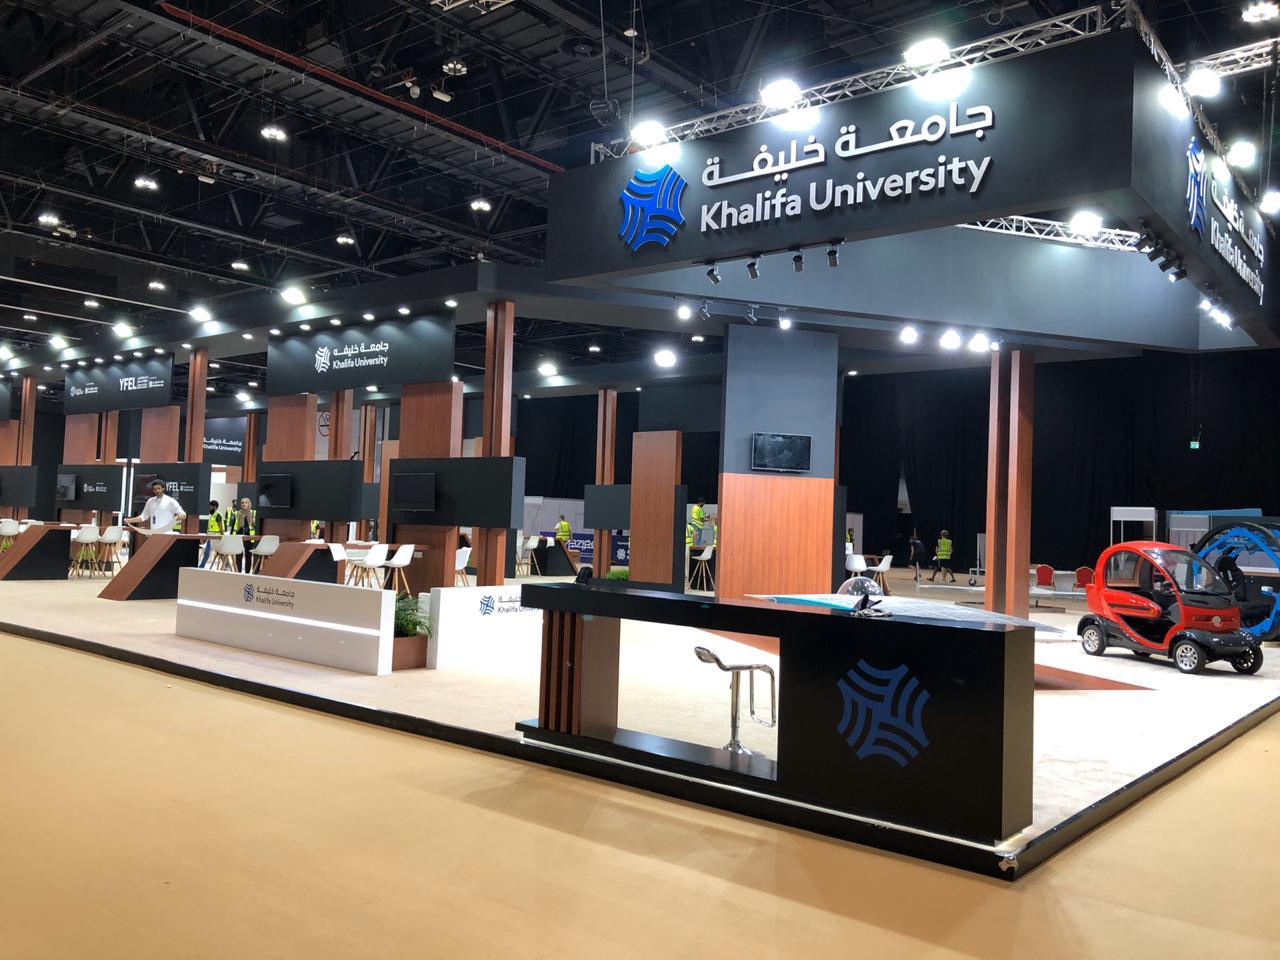 Khalifa University - 6